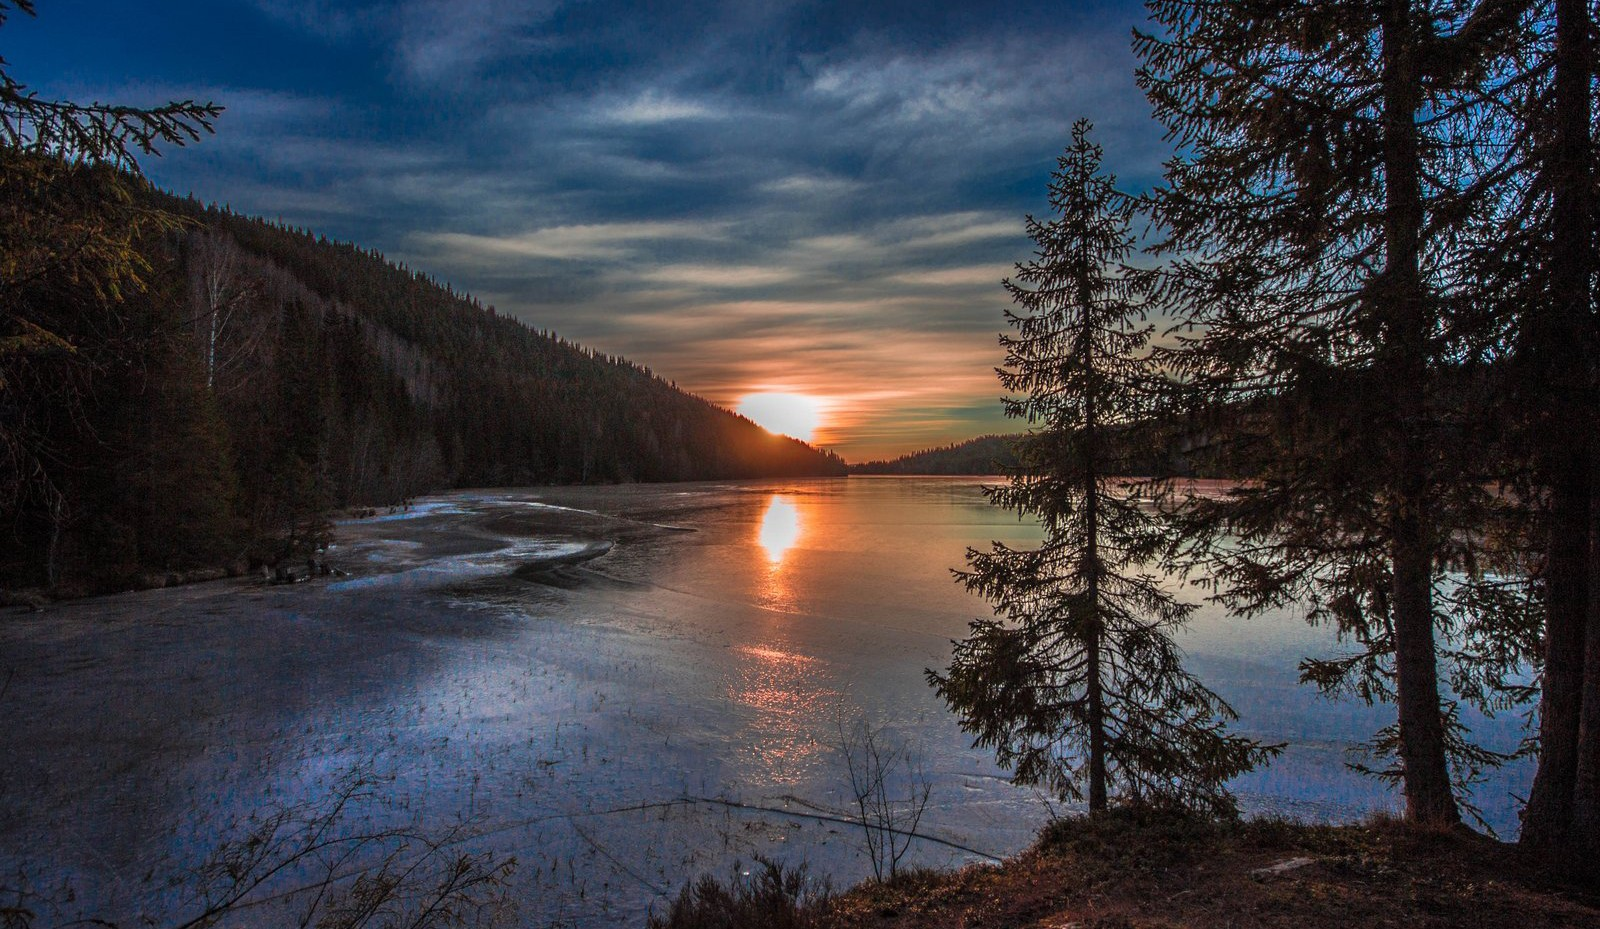 Solnedgang over Leklemsvatnet, på grensa mellom Verdal og Inderøy